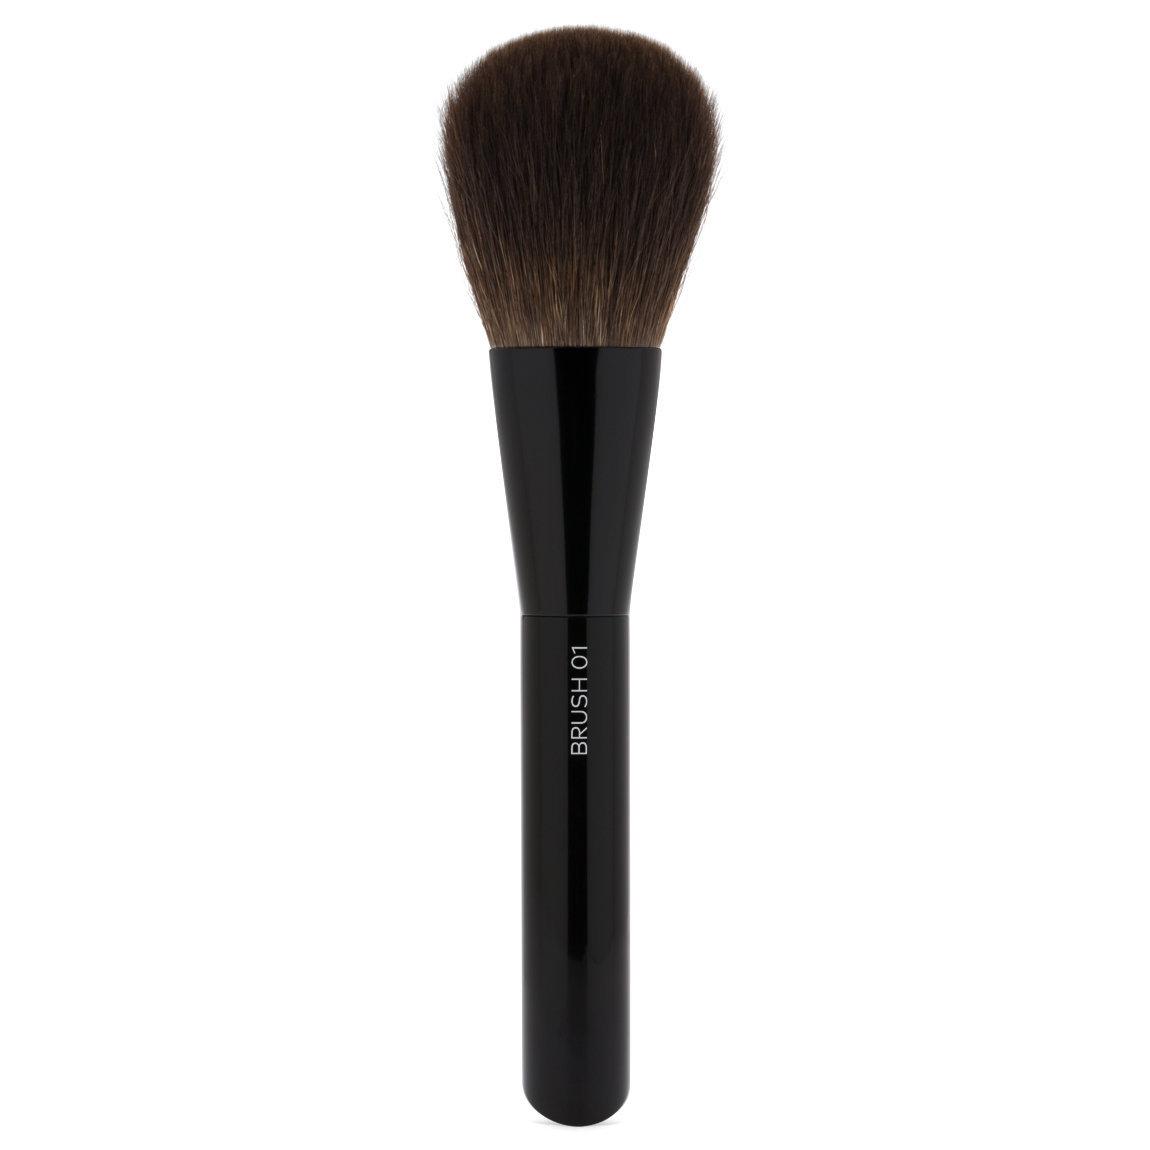 Beautylish Presents Yano Series Brush 01 Powder alternative view 1 - product swatch.